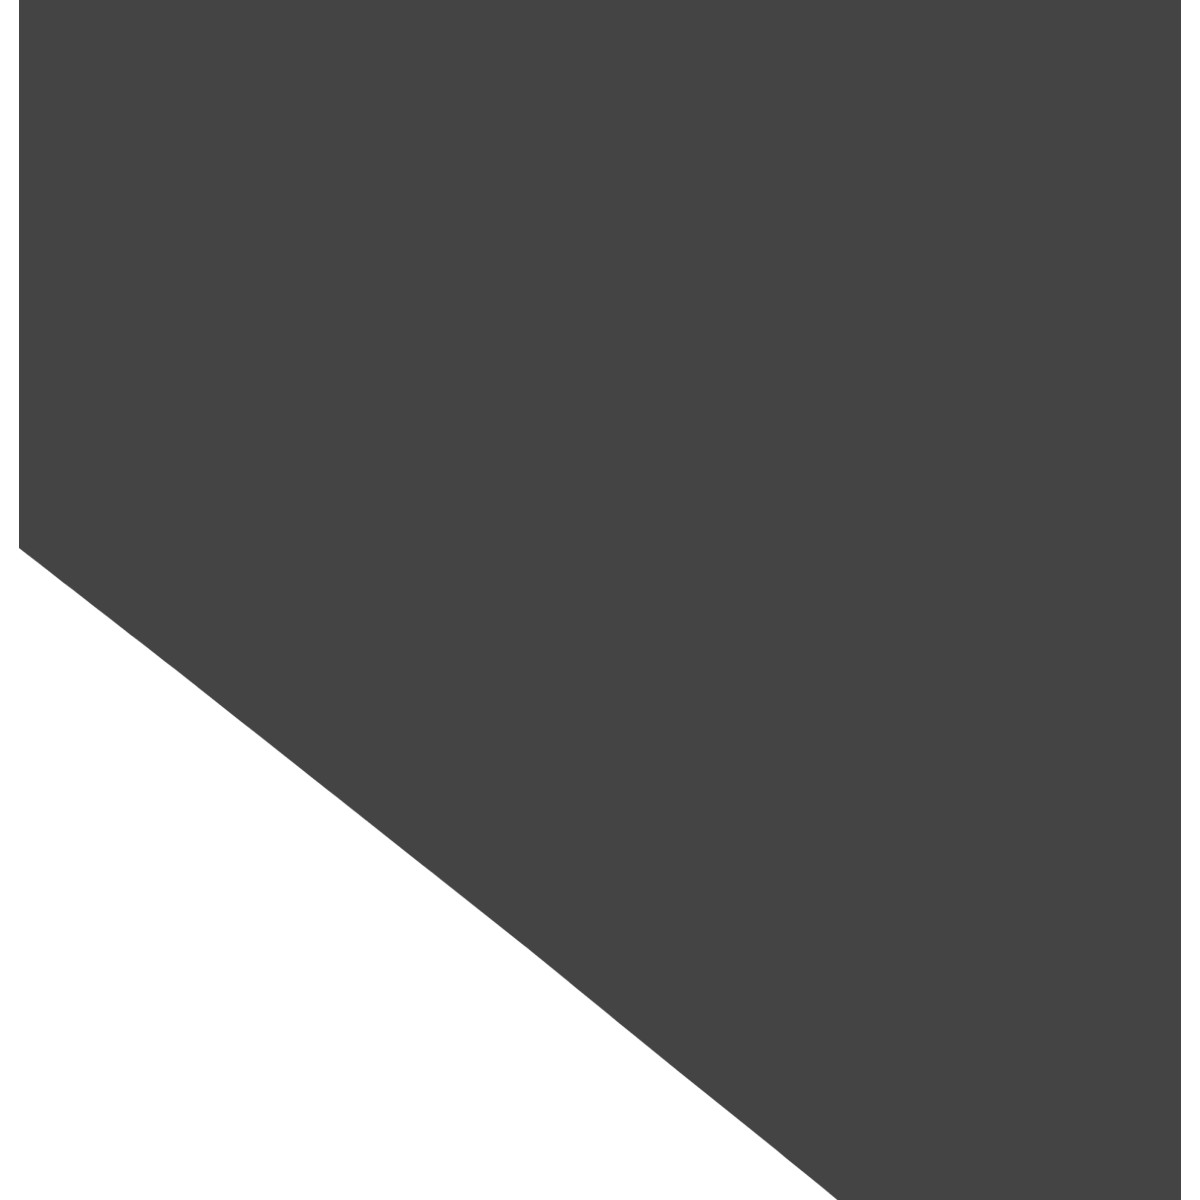 Лист 1.25х2 м 0.35 мм графитовый серый